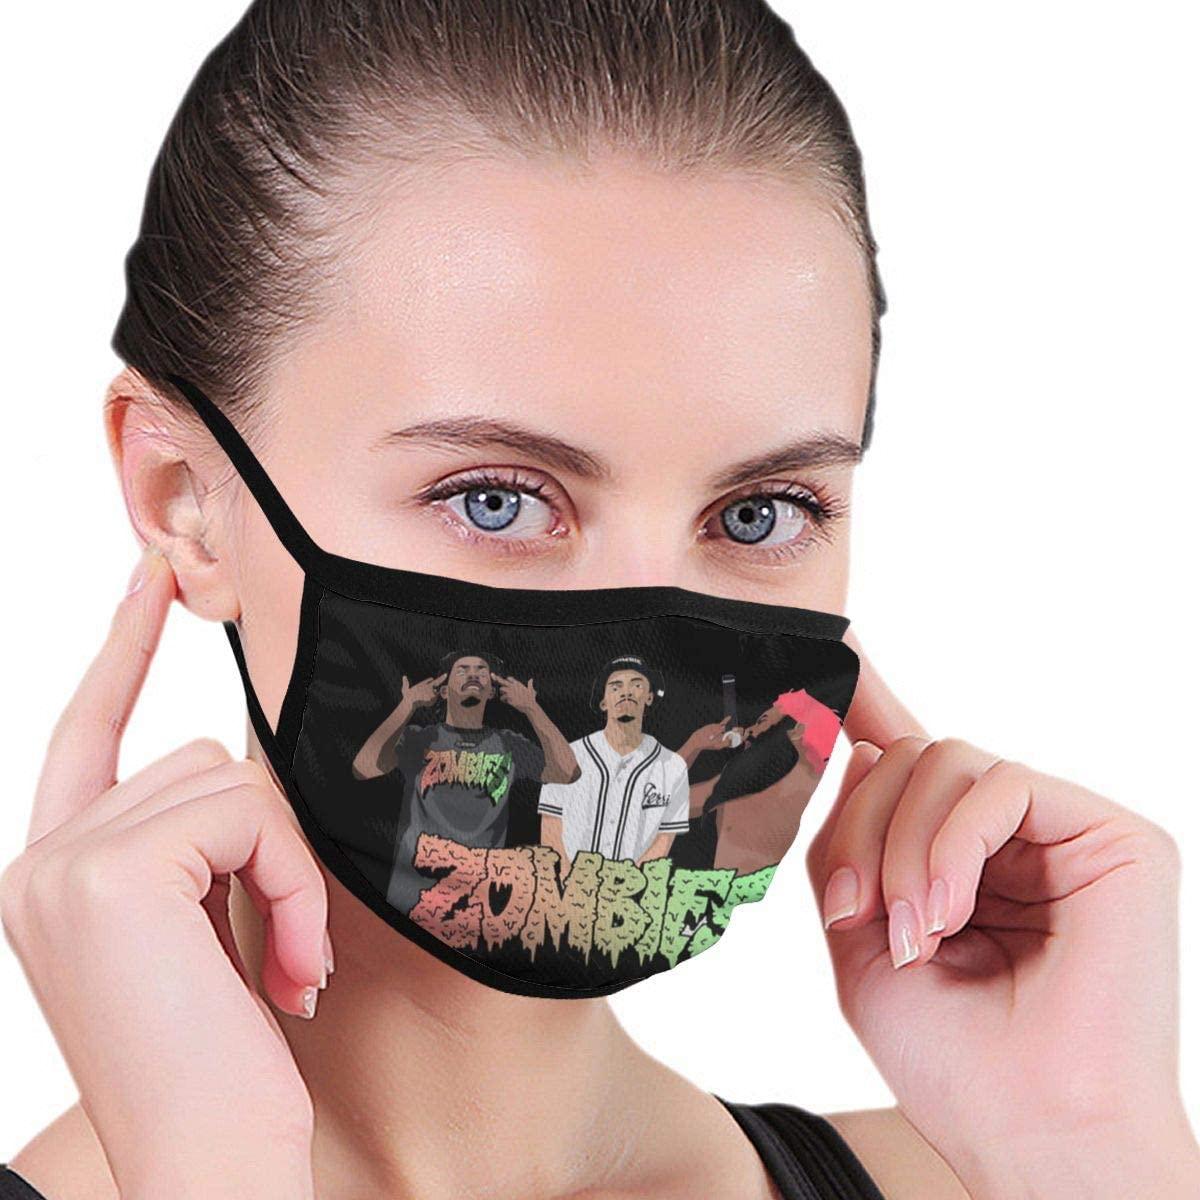 Flatbush Zombies Unisex Fashion Face Bandanas Head Band Wears Scarf Face Tube Neck Scarf